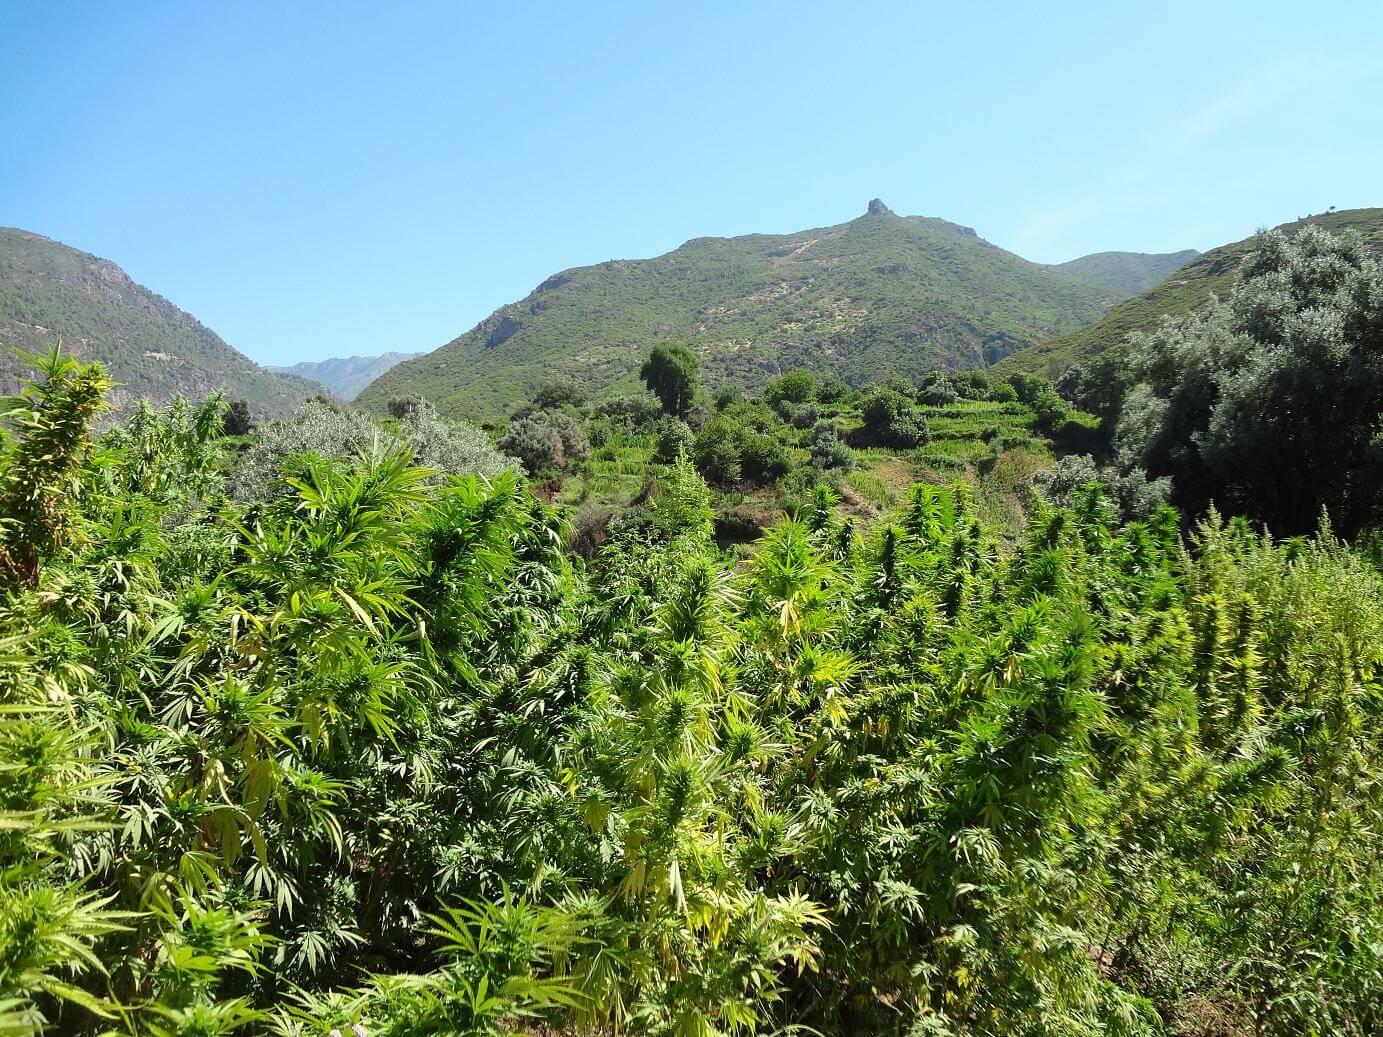 campo marihuana al sol, clima seco